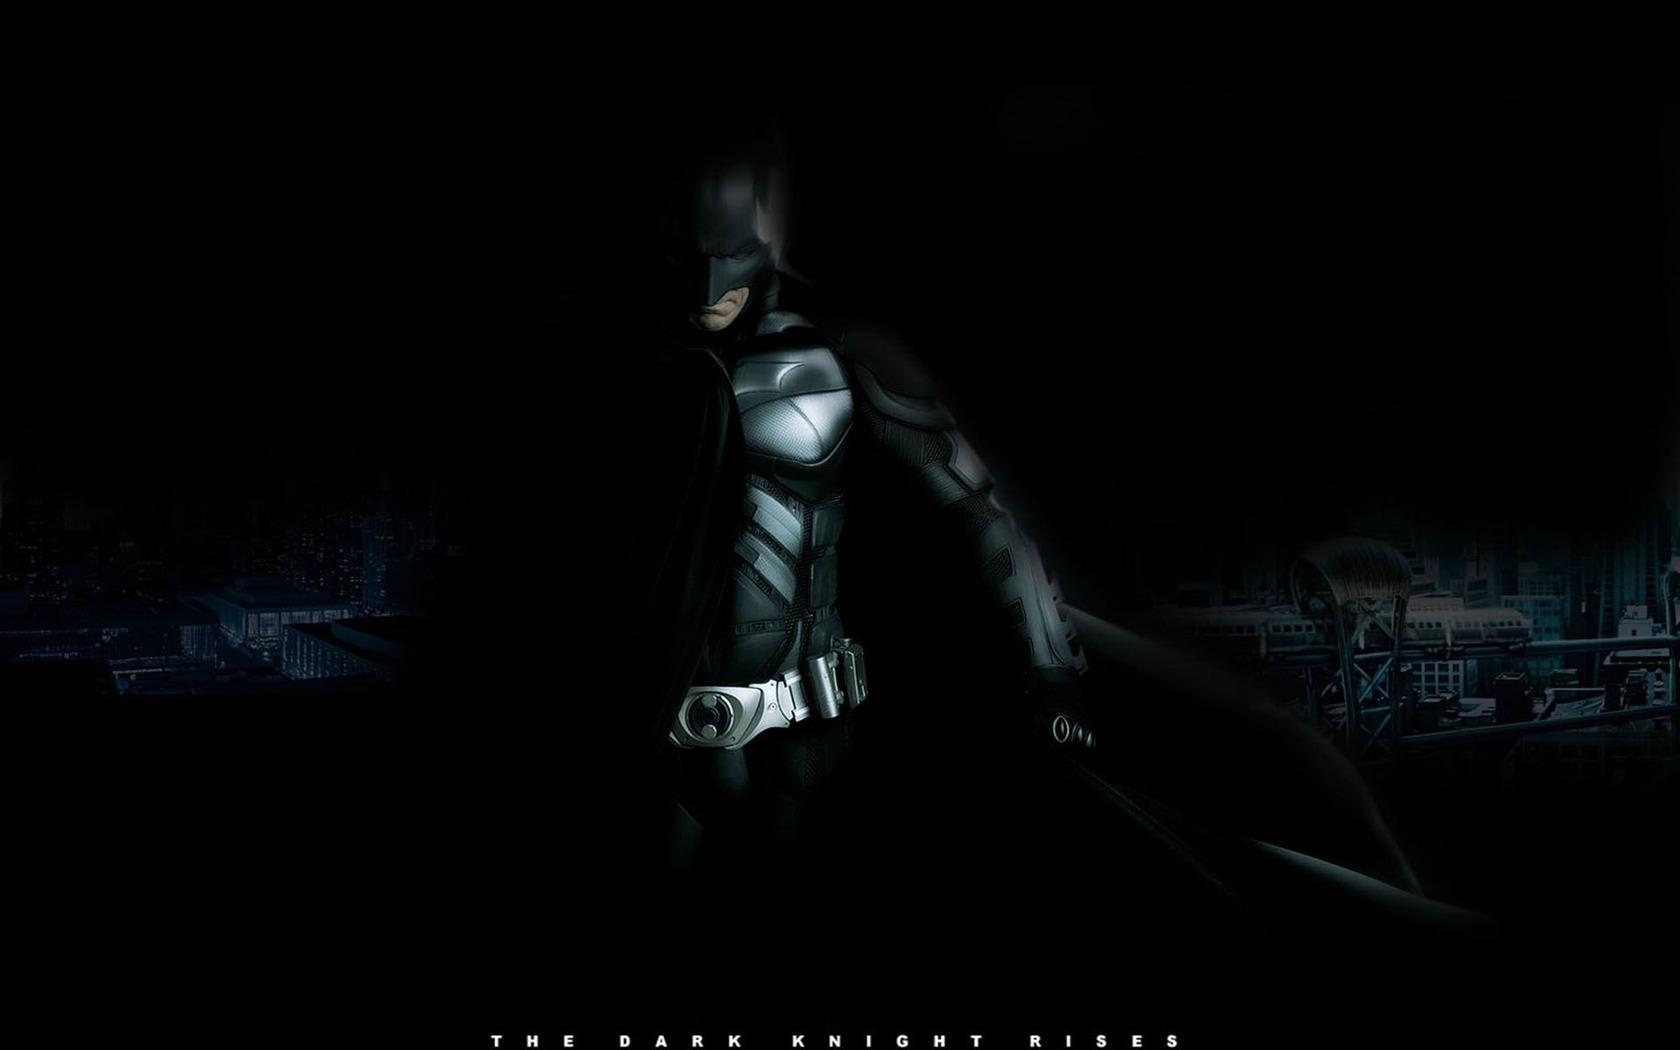 The Walking Dead Logo 2014 Fondo De Pantalla Fondos De: The Dark Knight Rises 2012 Movie HD Wallpaper 19-1680x1050